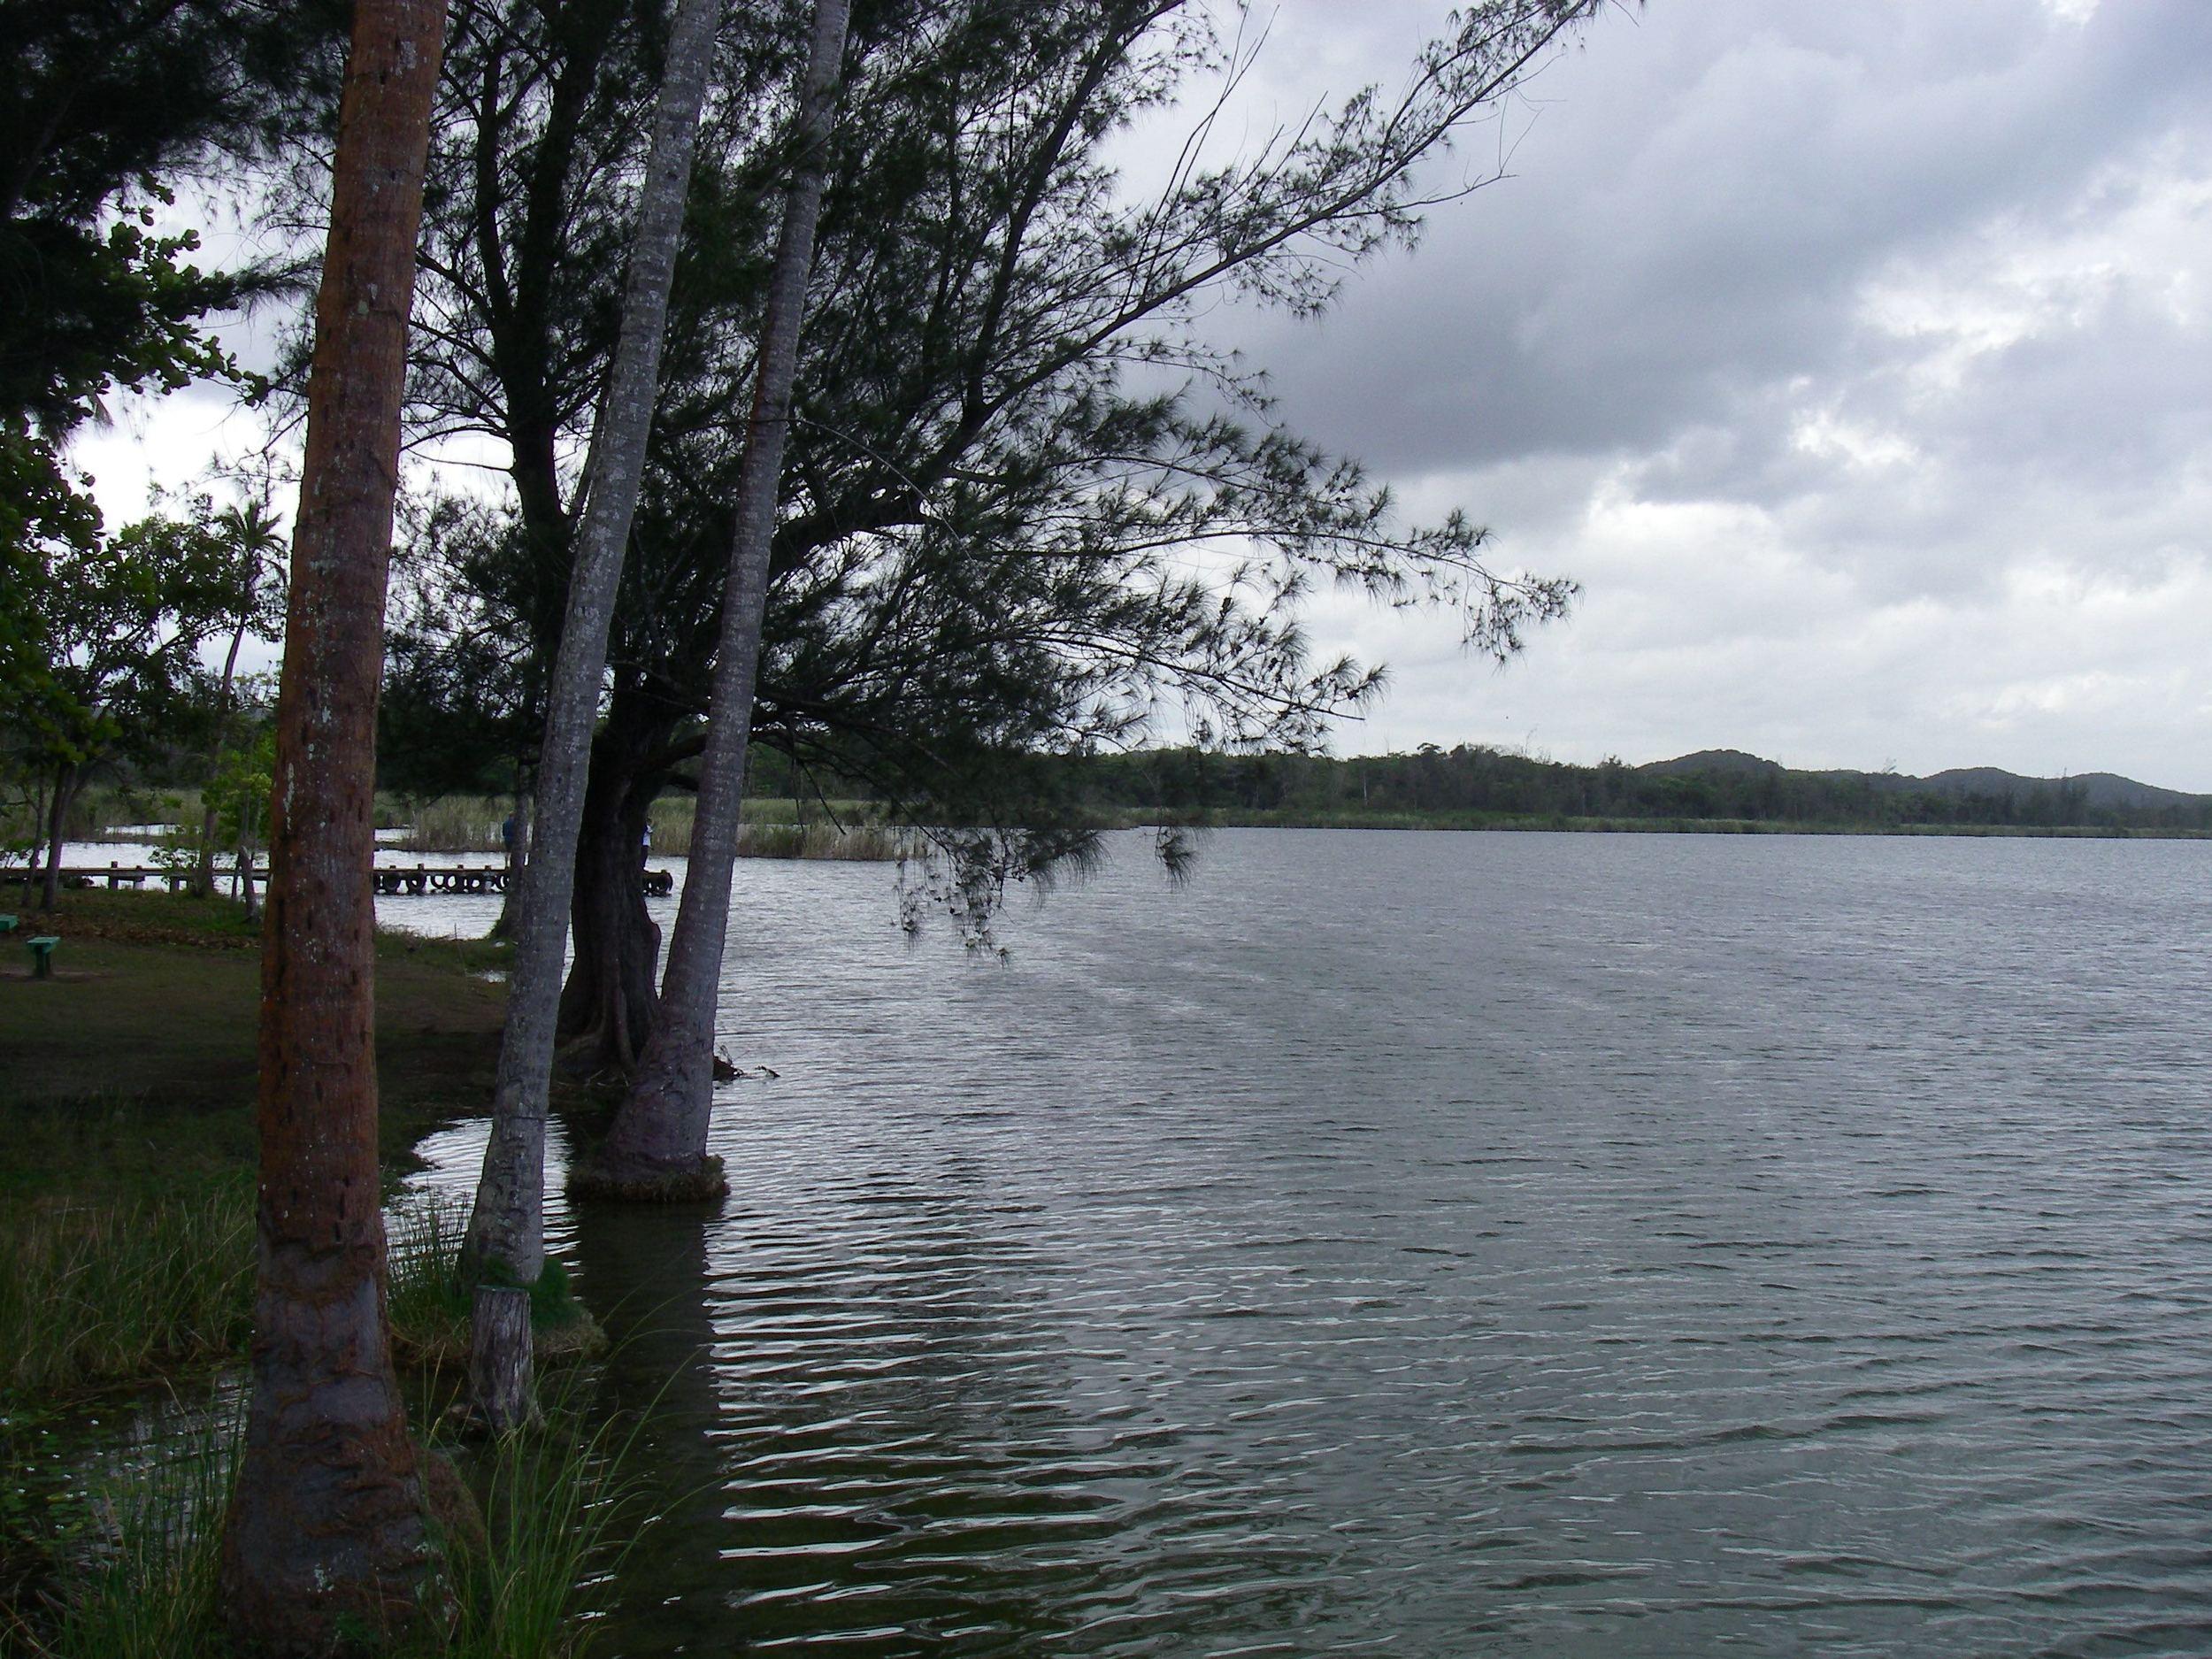 Laguna Tortuguero, Puerto Rico, 2006. Photo credit: Maria A. Caffrey.